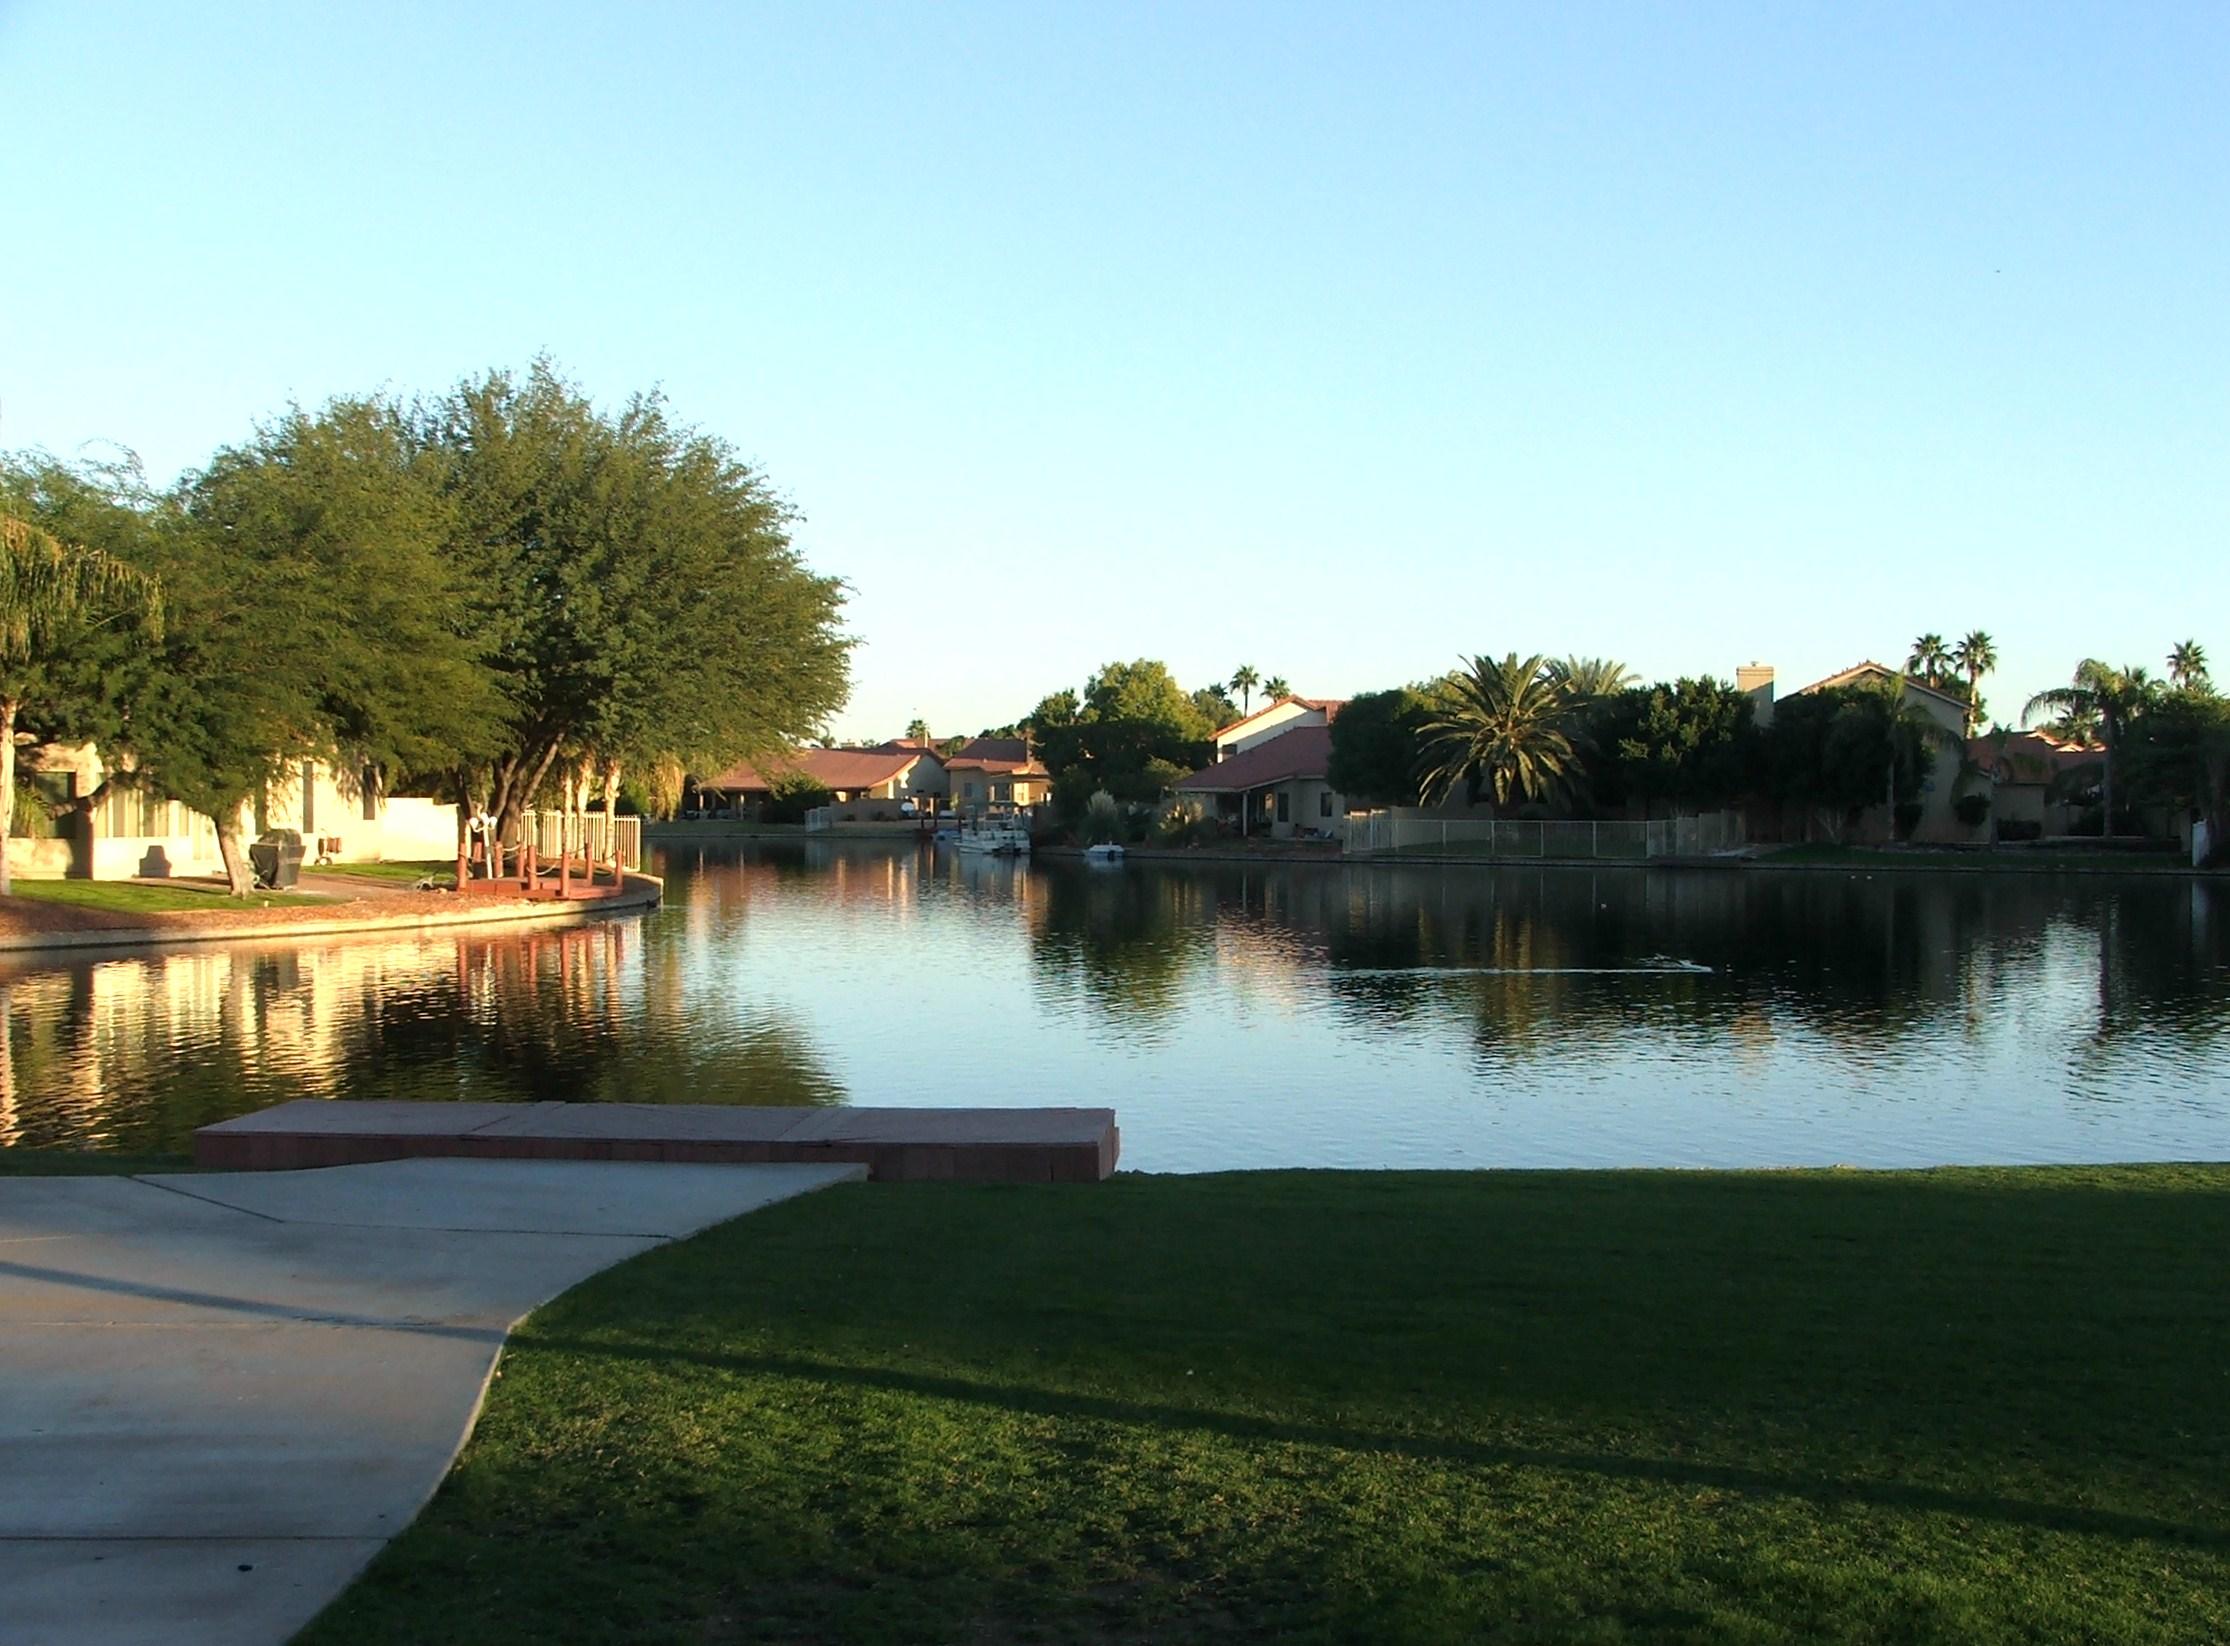 Garden lakes waterfront homes in avondale phoenix - Garden city union free school district ...